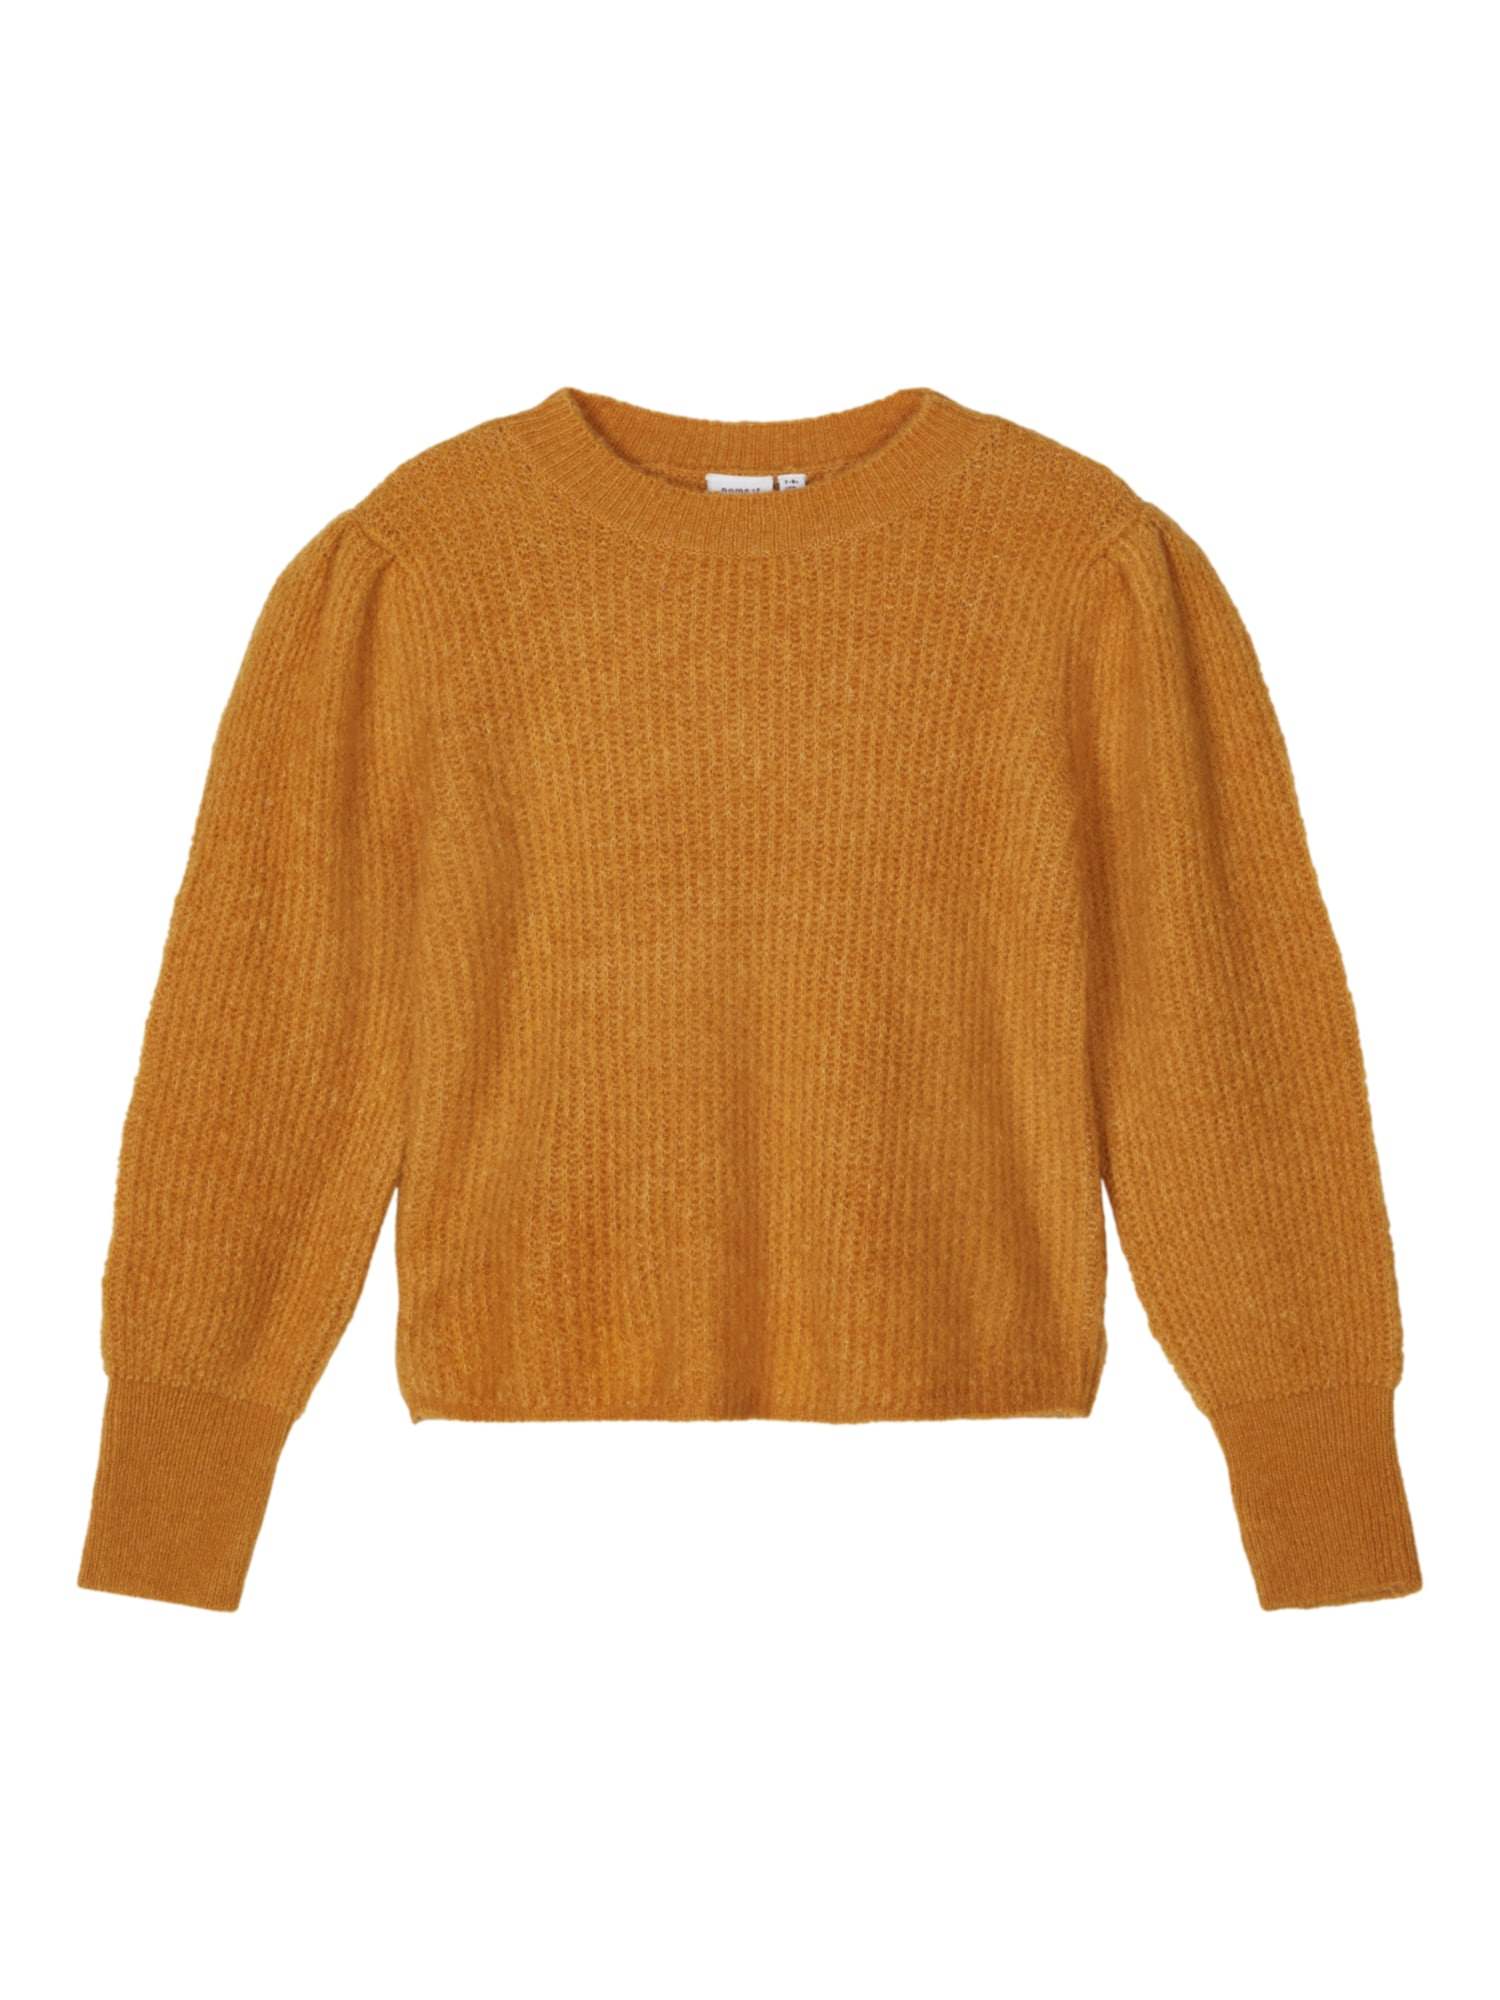 NAME IT Megztinis geltona